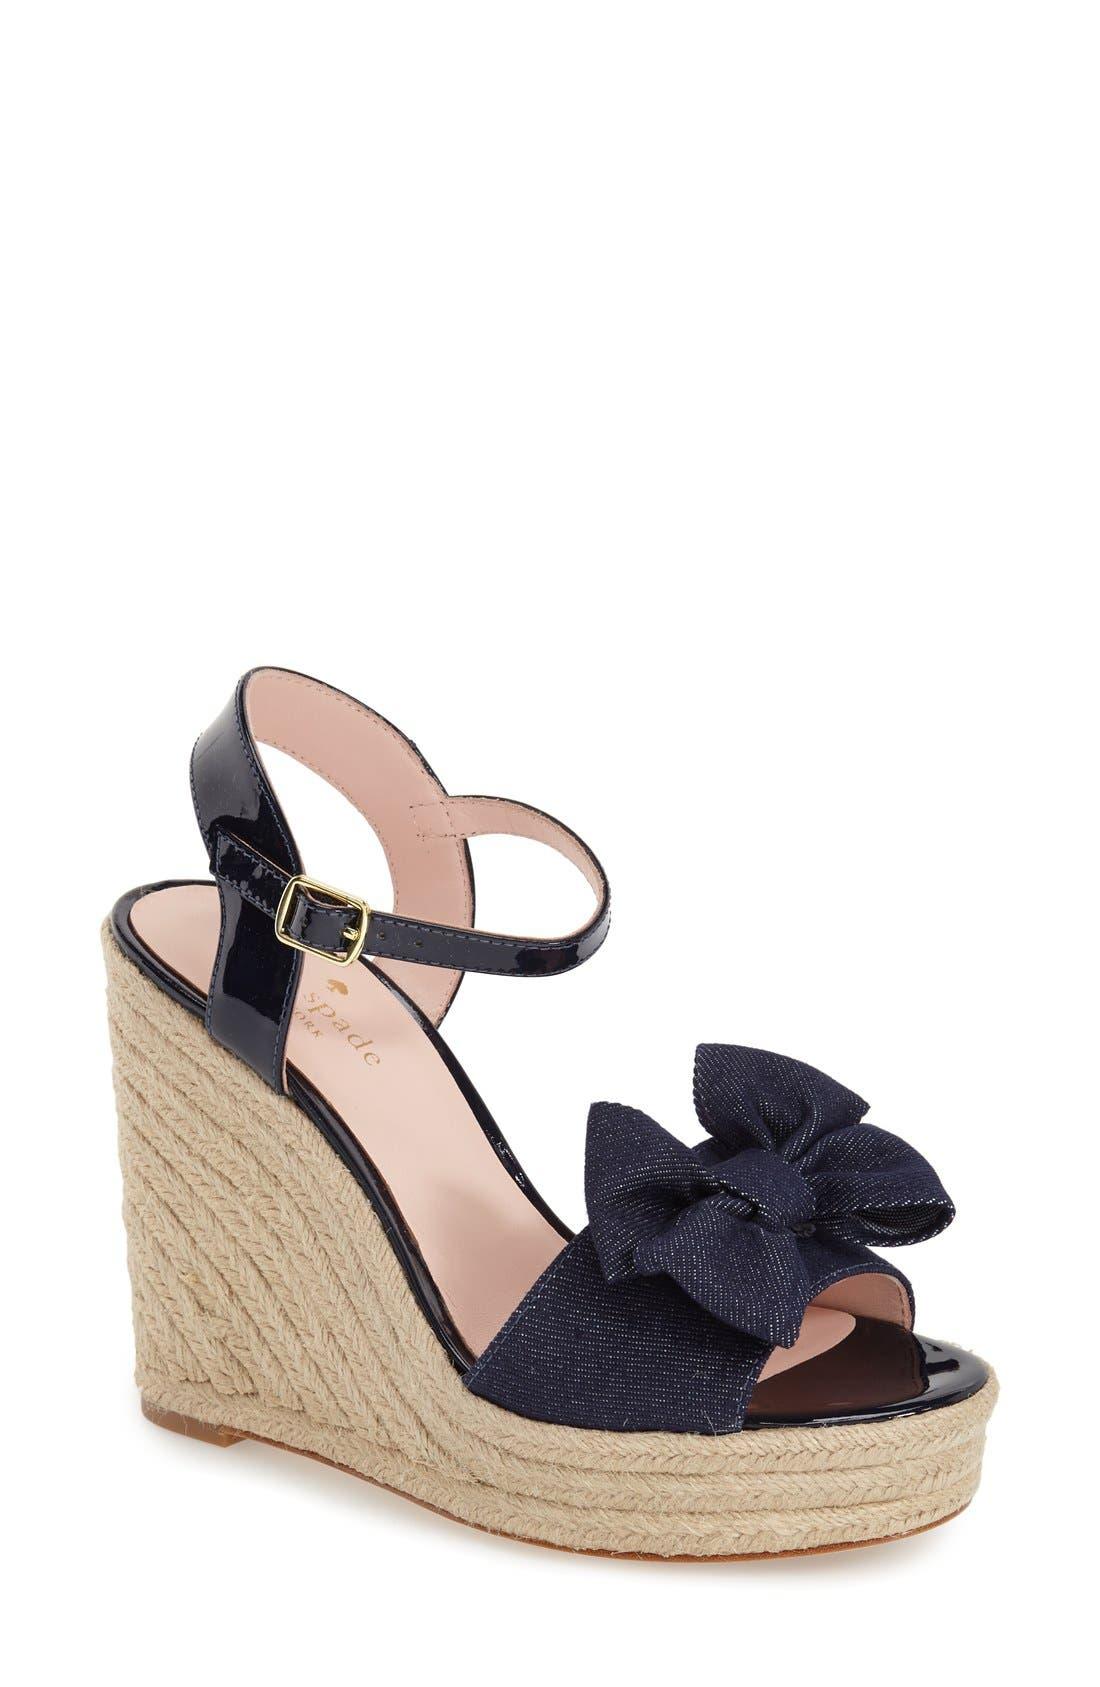 Alternate Image 1 Selected - kate spade new york 'darya' wedge sandal (Women)